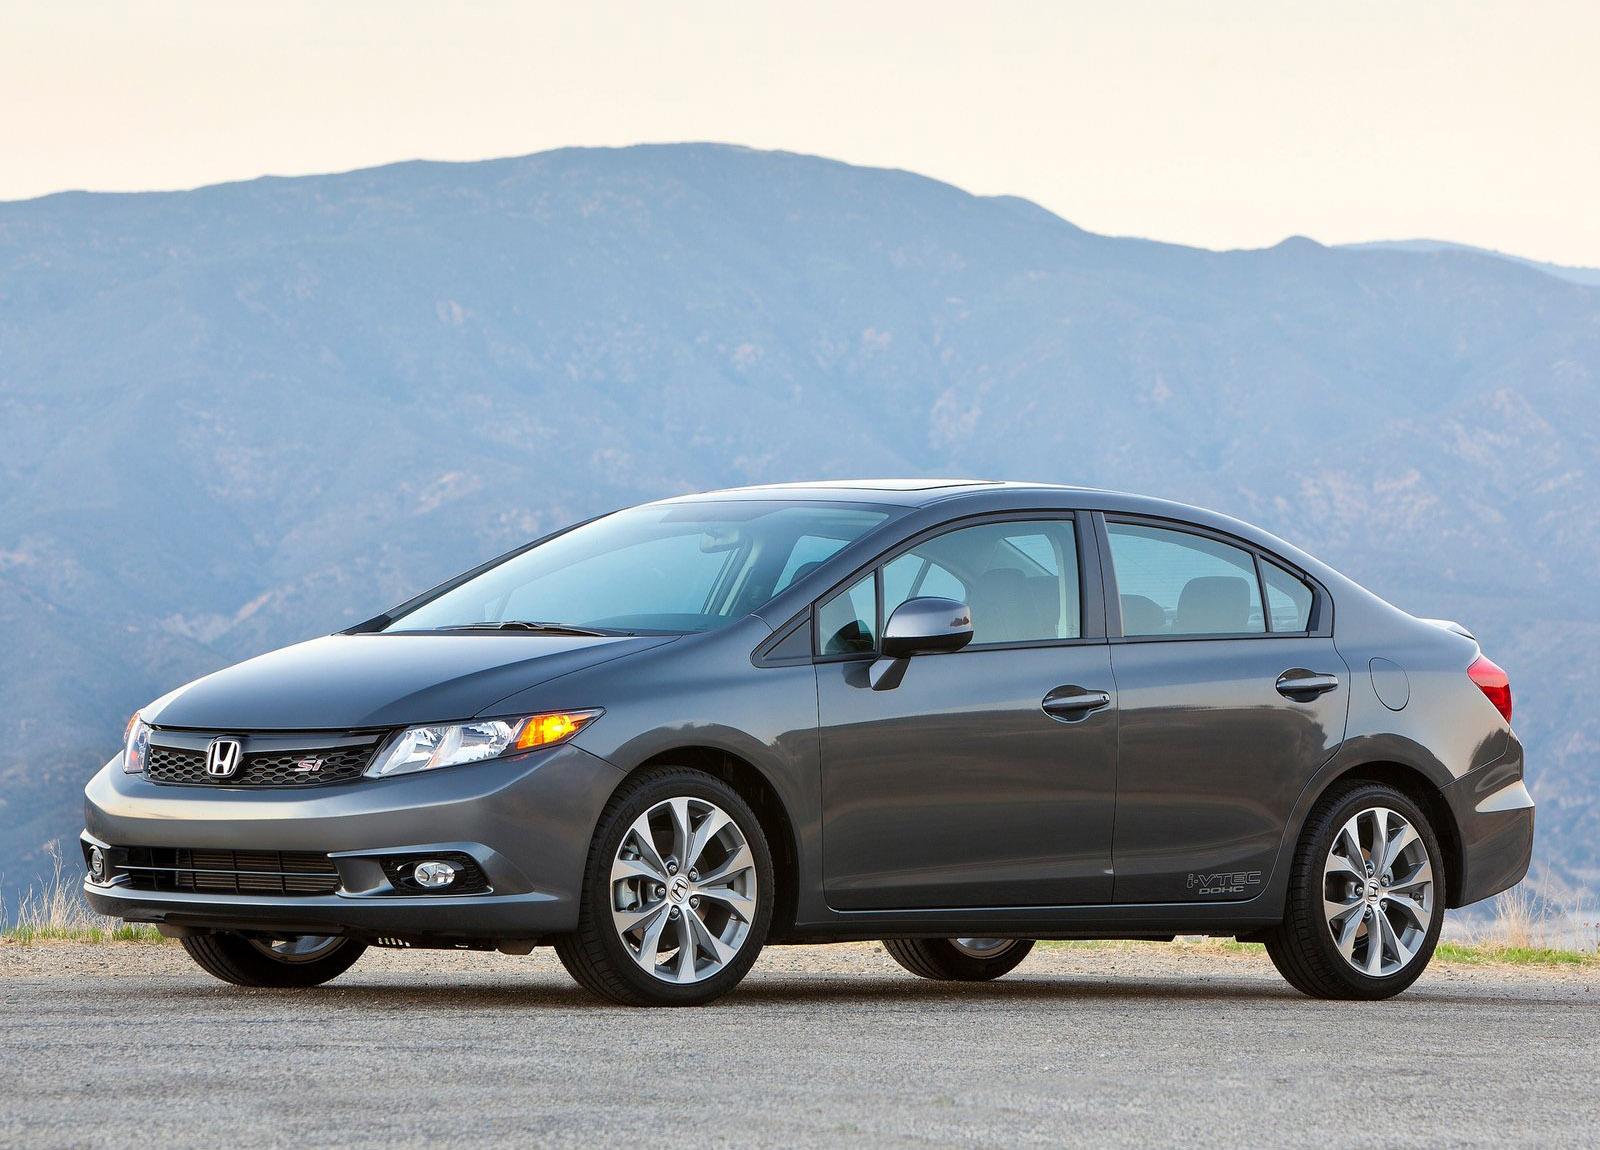 2012 Honda Civic Si Sedan - HD Pictures @ carsinvasion.com